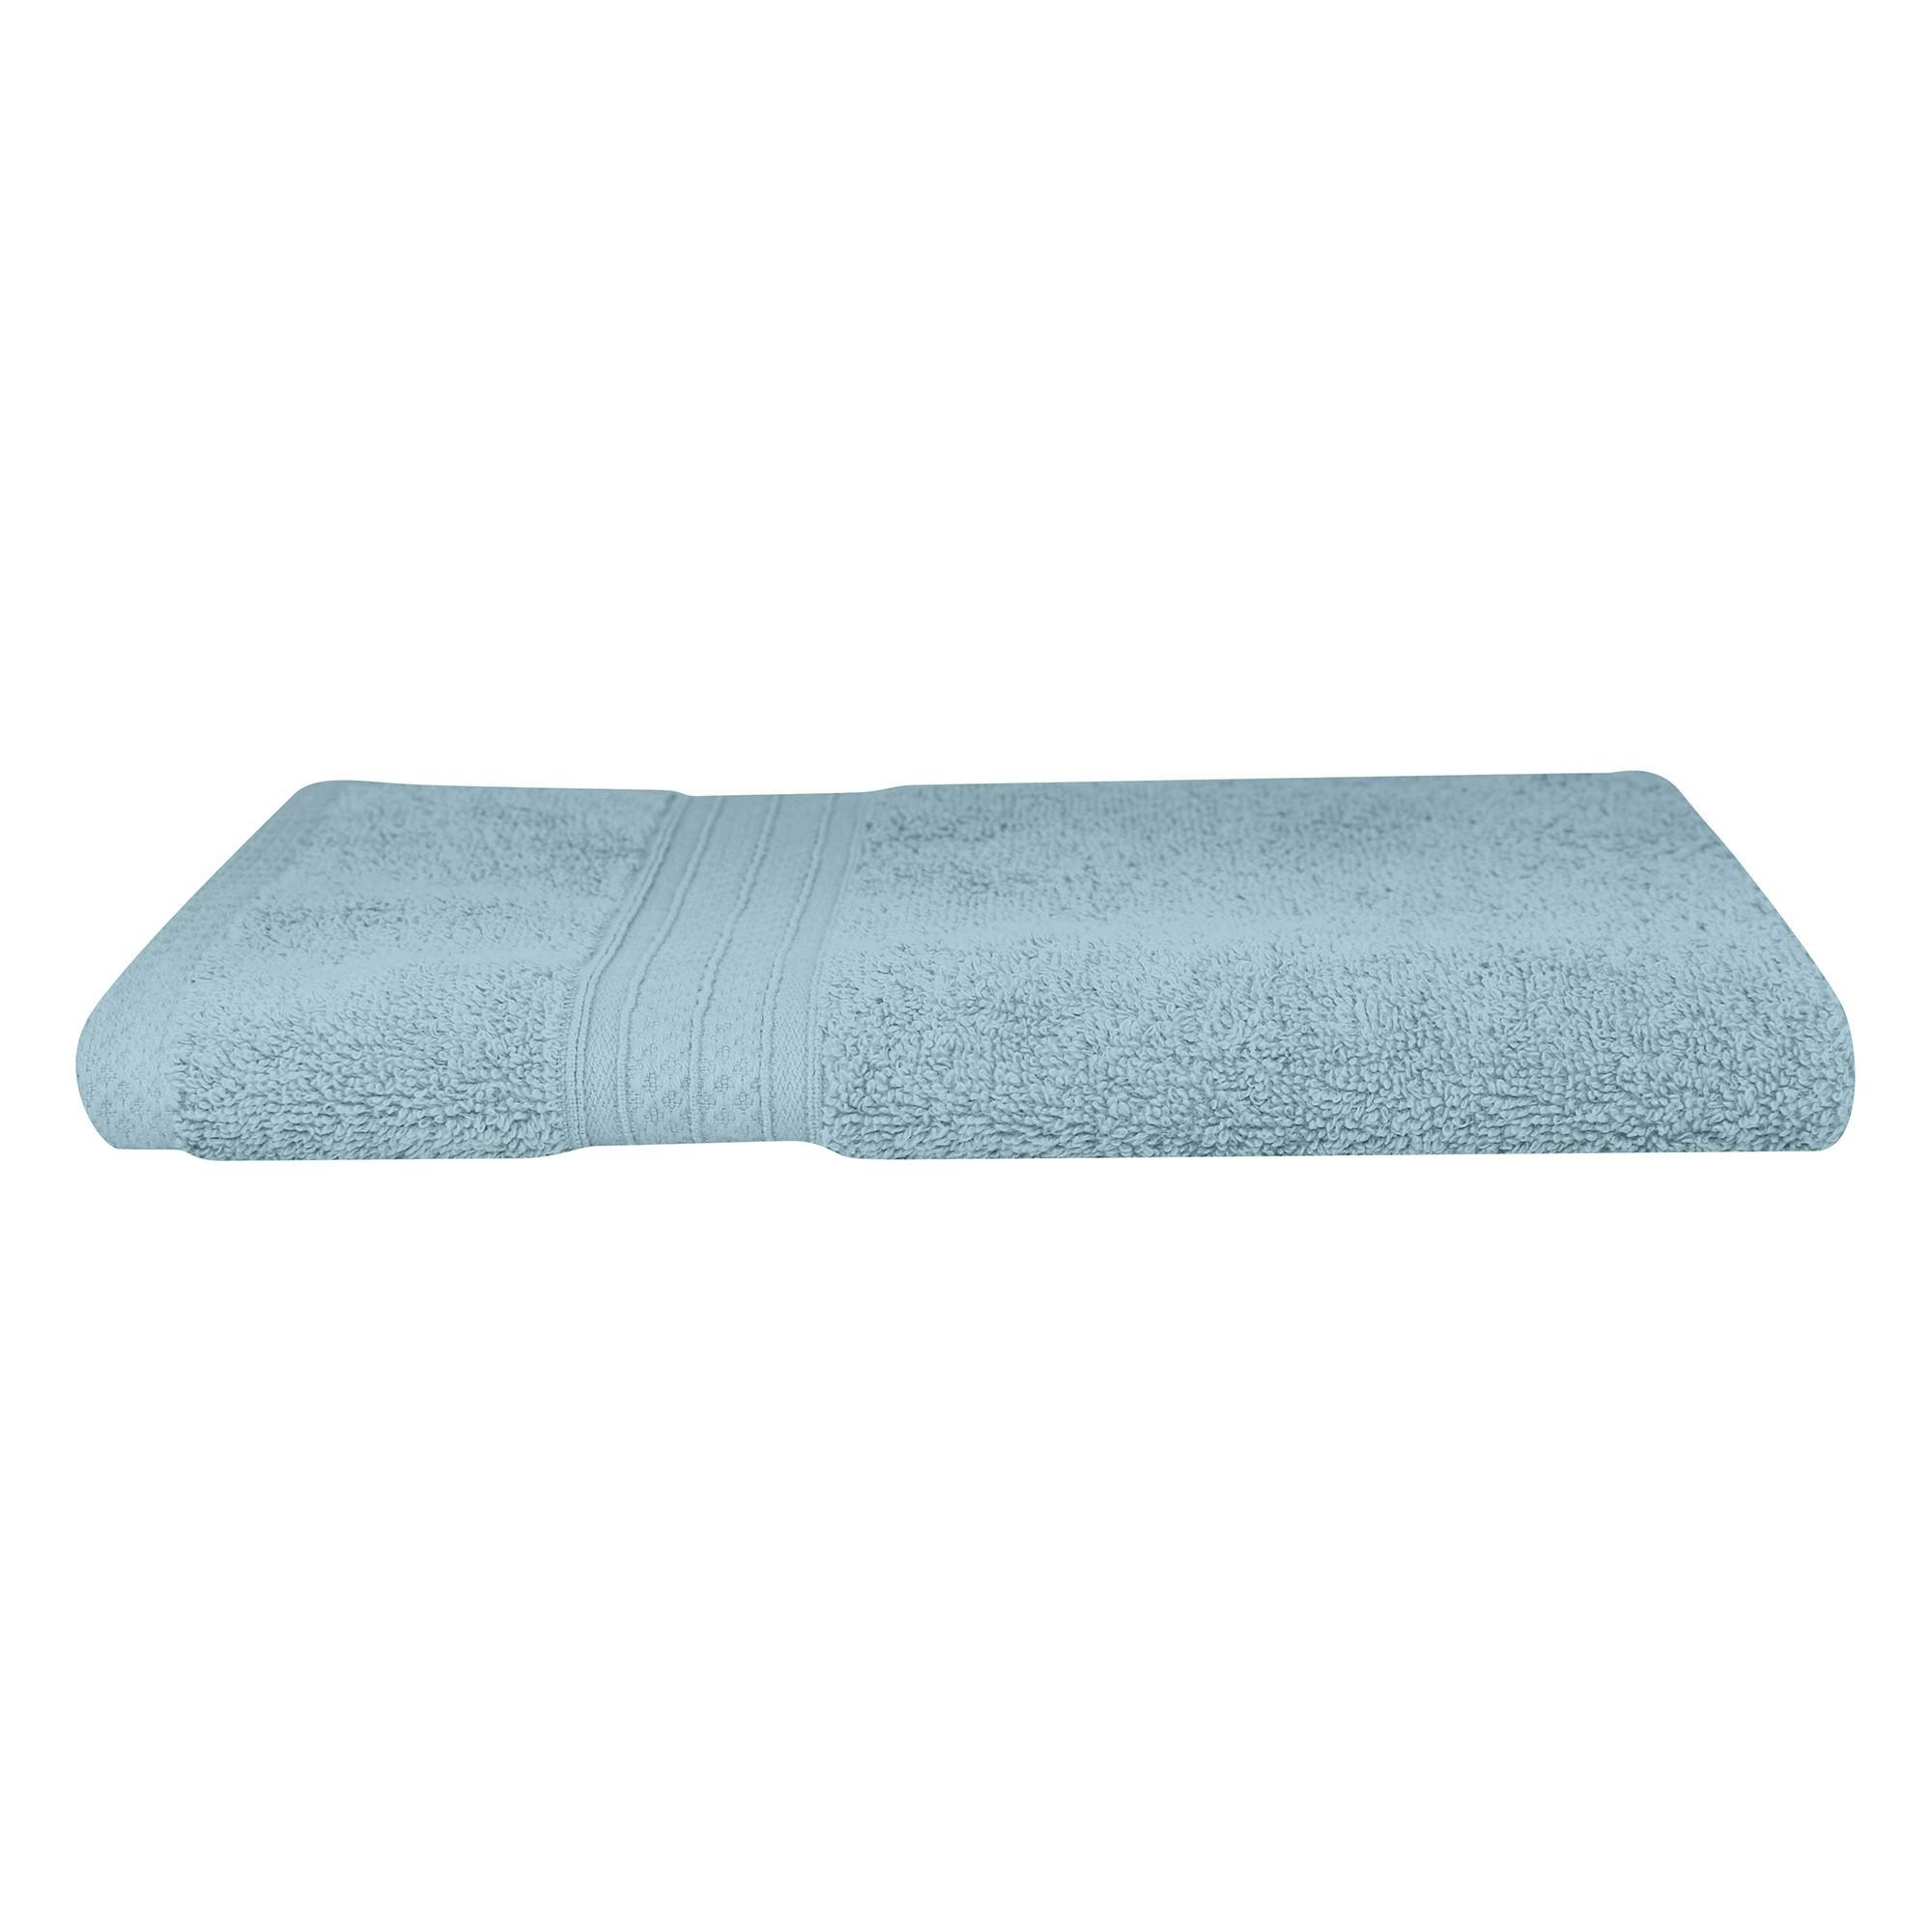 Odyssey Living Meridian Cotton Hand Towel, Cornflower Blue